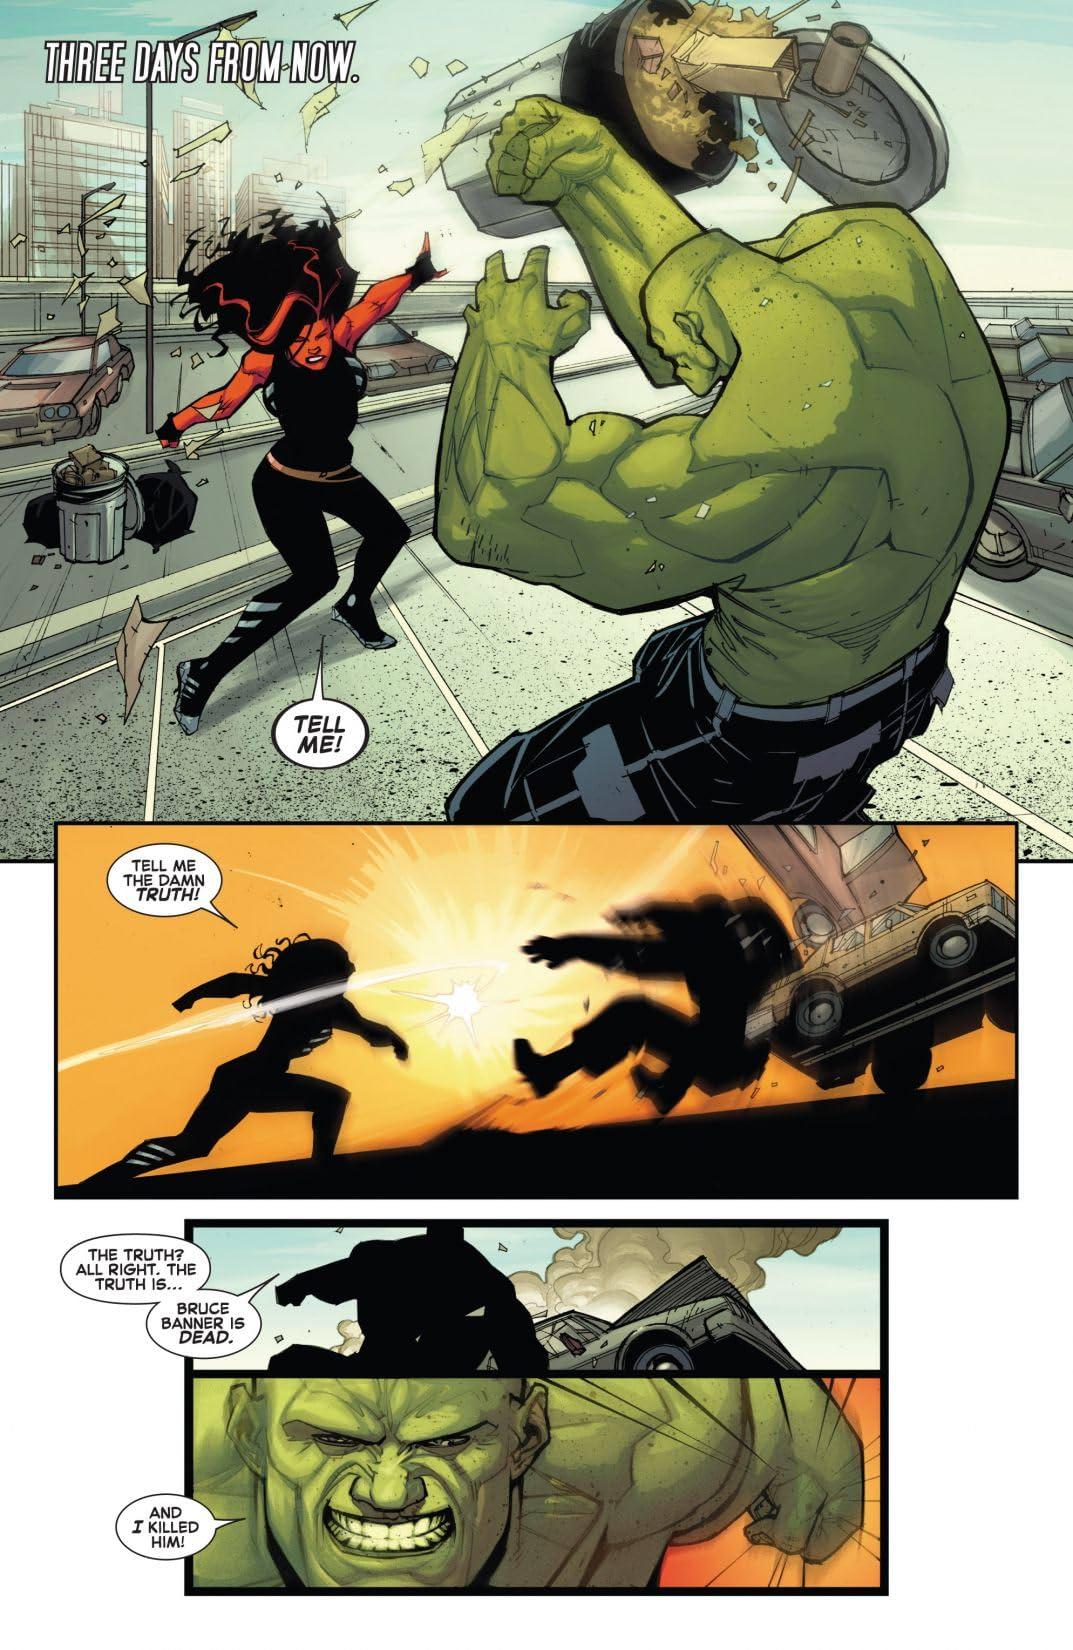 Incredible Hulk By Jason Aaron Vol. 2